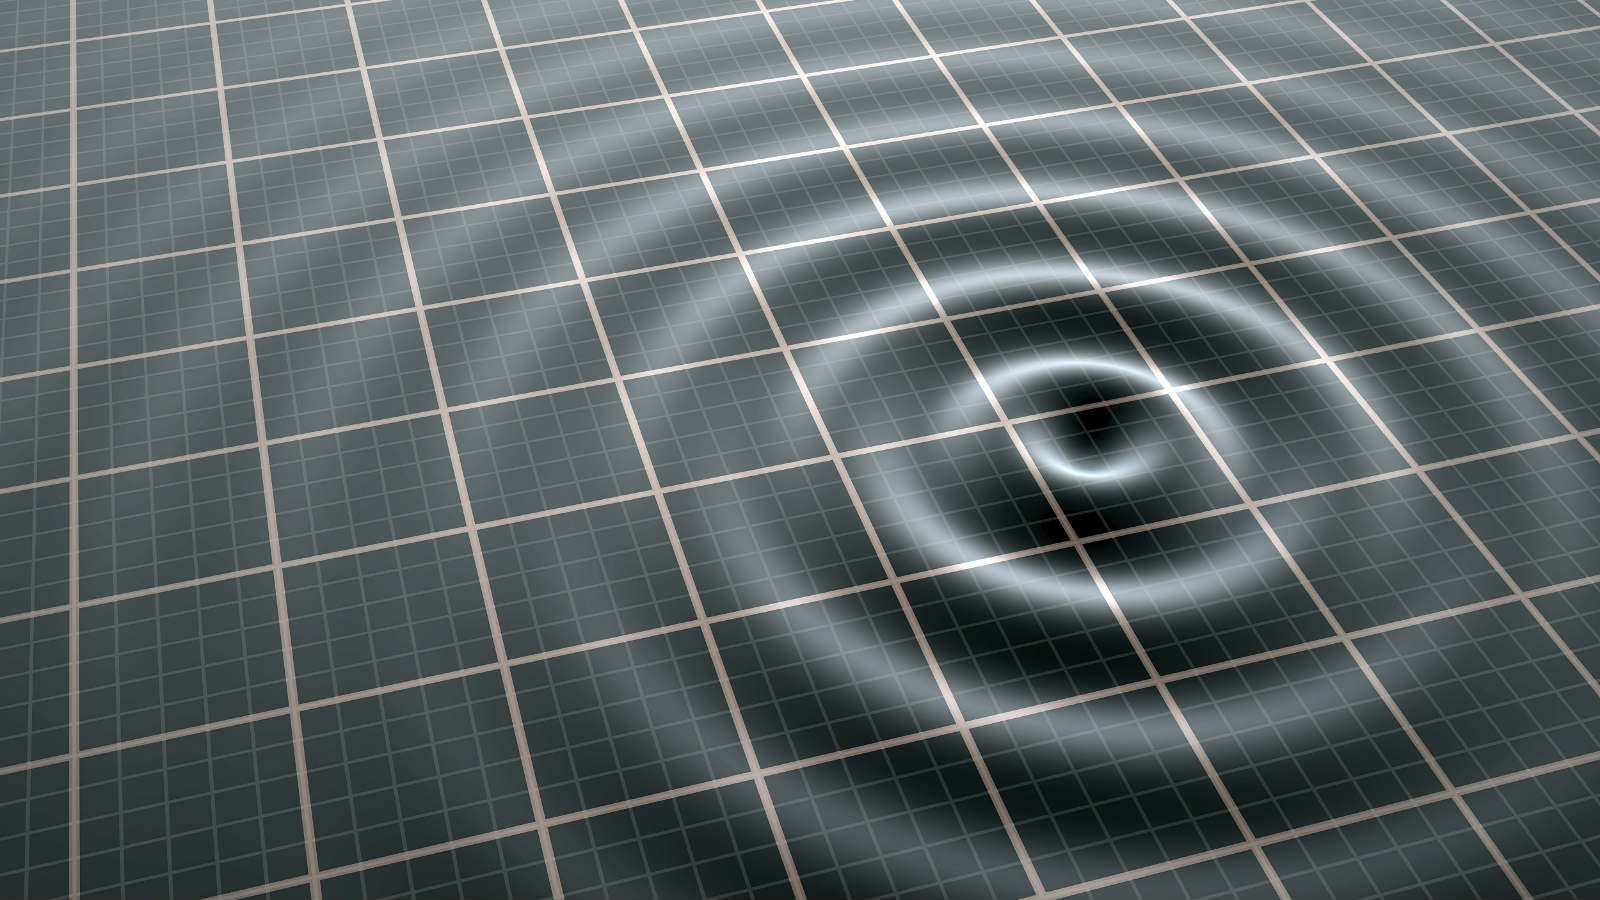 7.1-magnitude quake strikes off Japan's Fukushima Prefecture